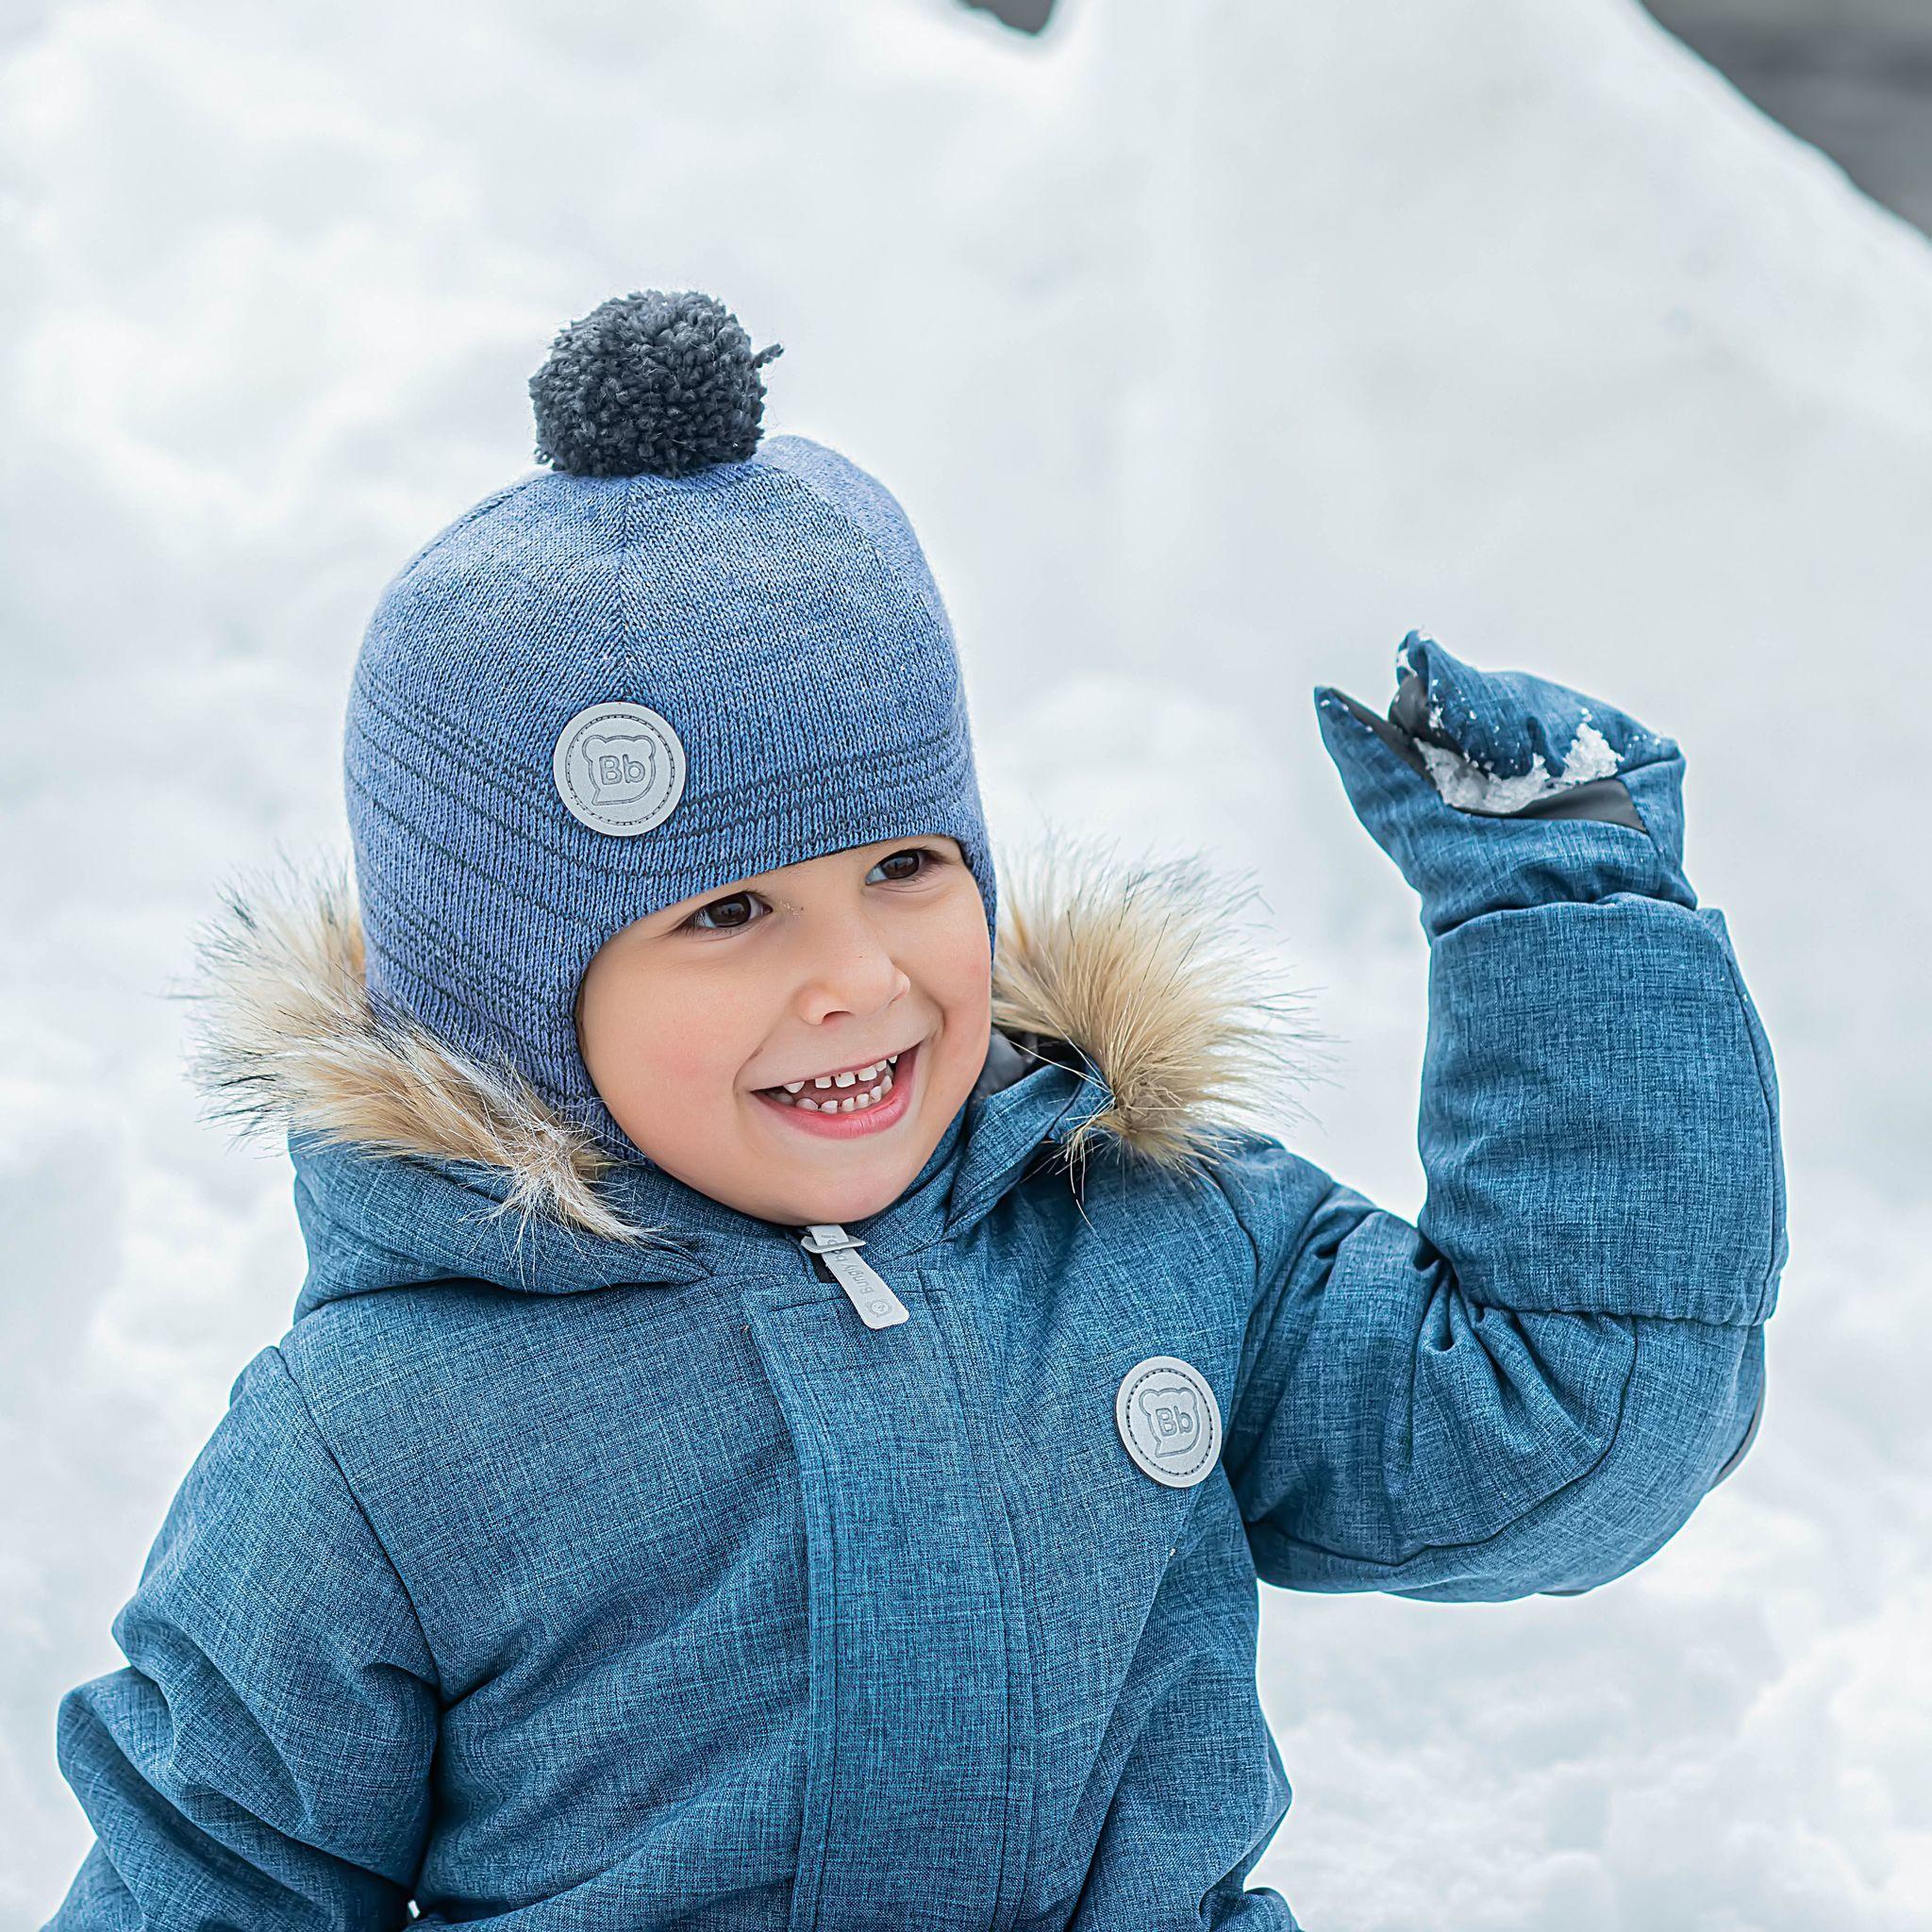 Winter knitted balaclava with pompon - Denim-Graphite Melange